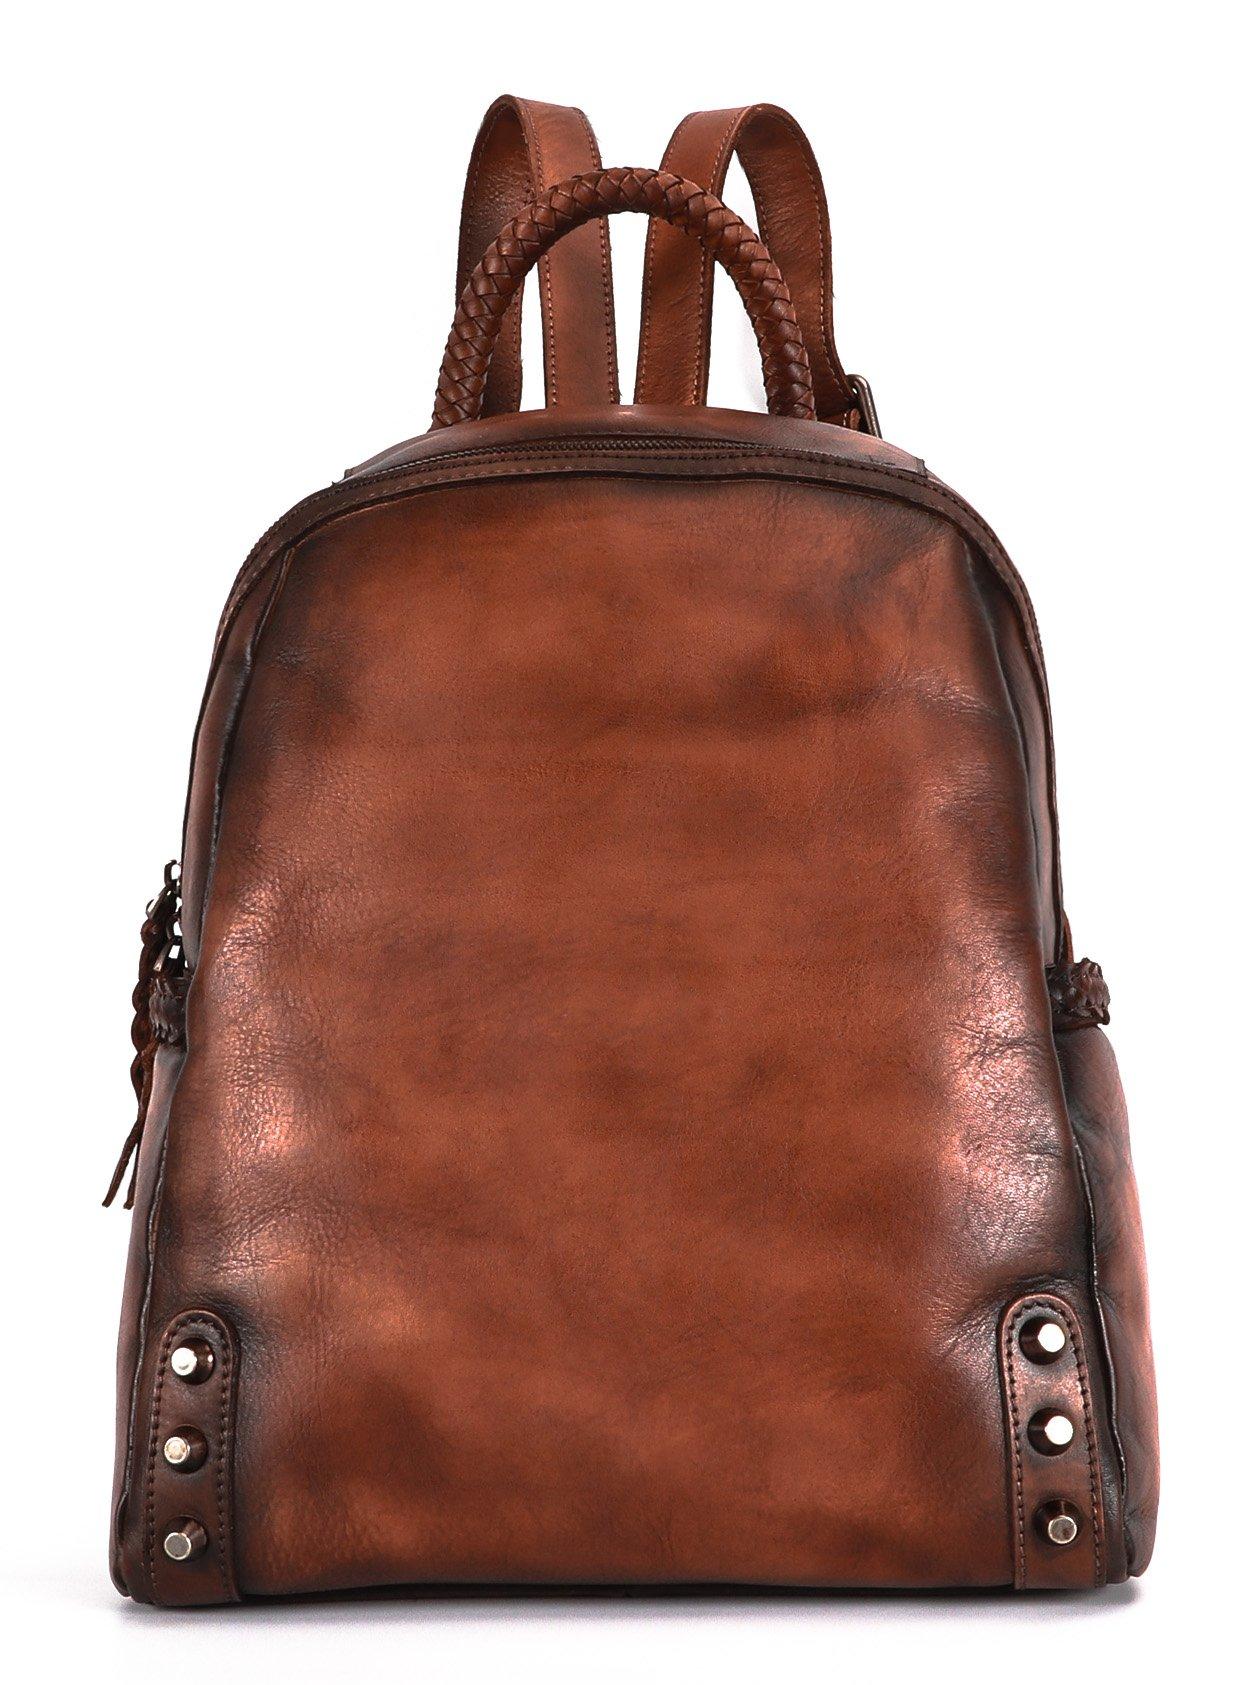 Sophmoda Vintage Style Genuine Cow Leather Backpack Women's Shoulder Bag-A327 (Coffee)